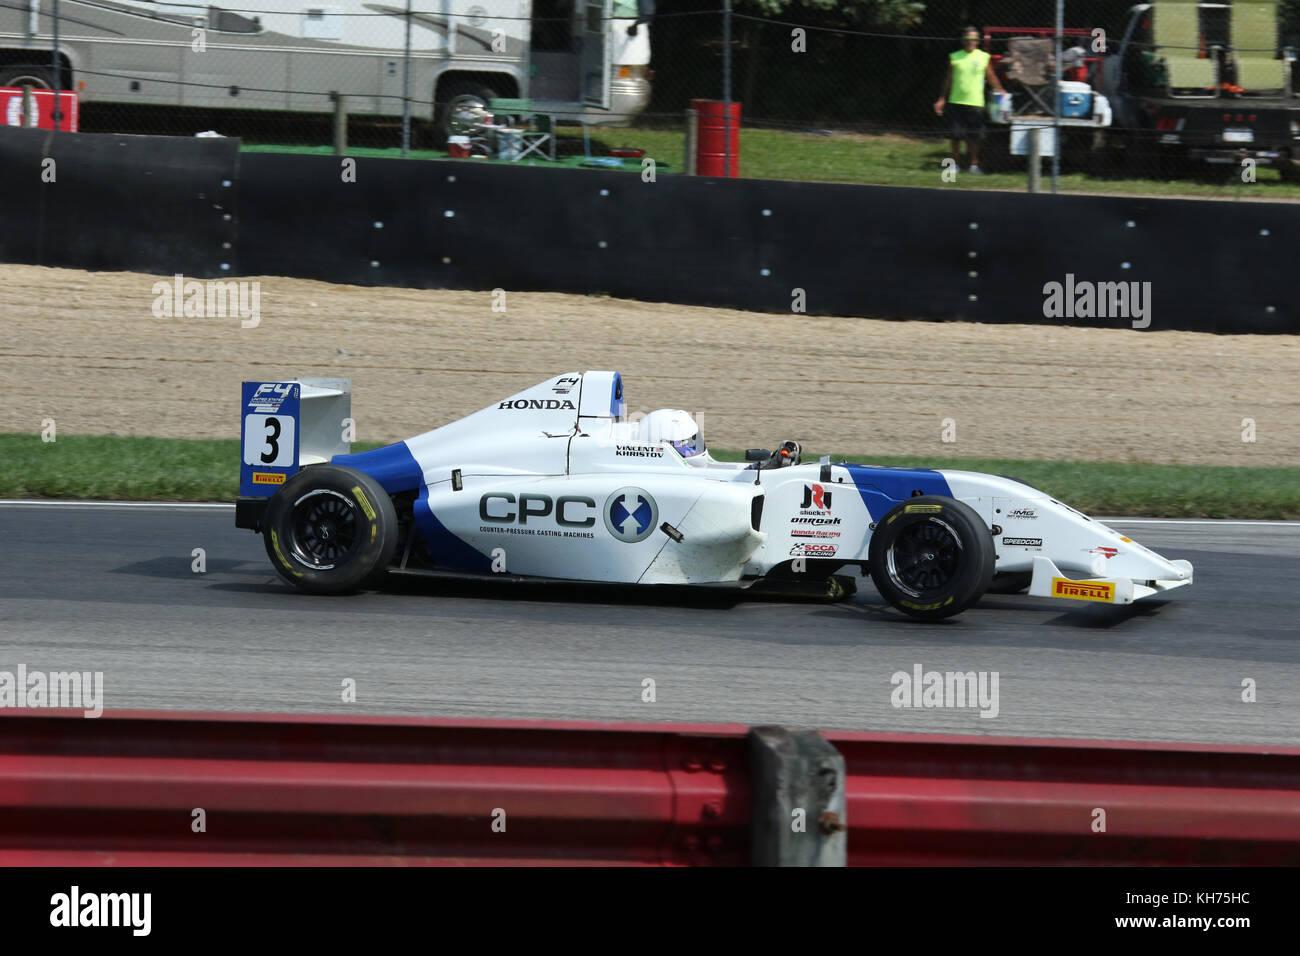 Vincent Khristov. Car 3. Formula 4 Race. Mid-Ohio Sports Car Course. Lexington, Mansfield, Ohio, USA. - Stock Image